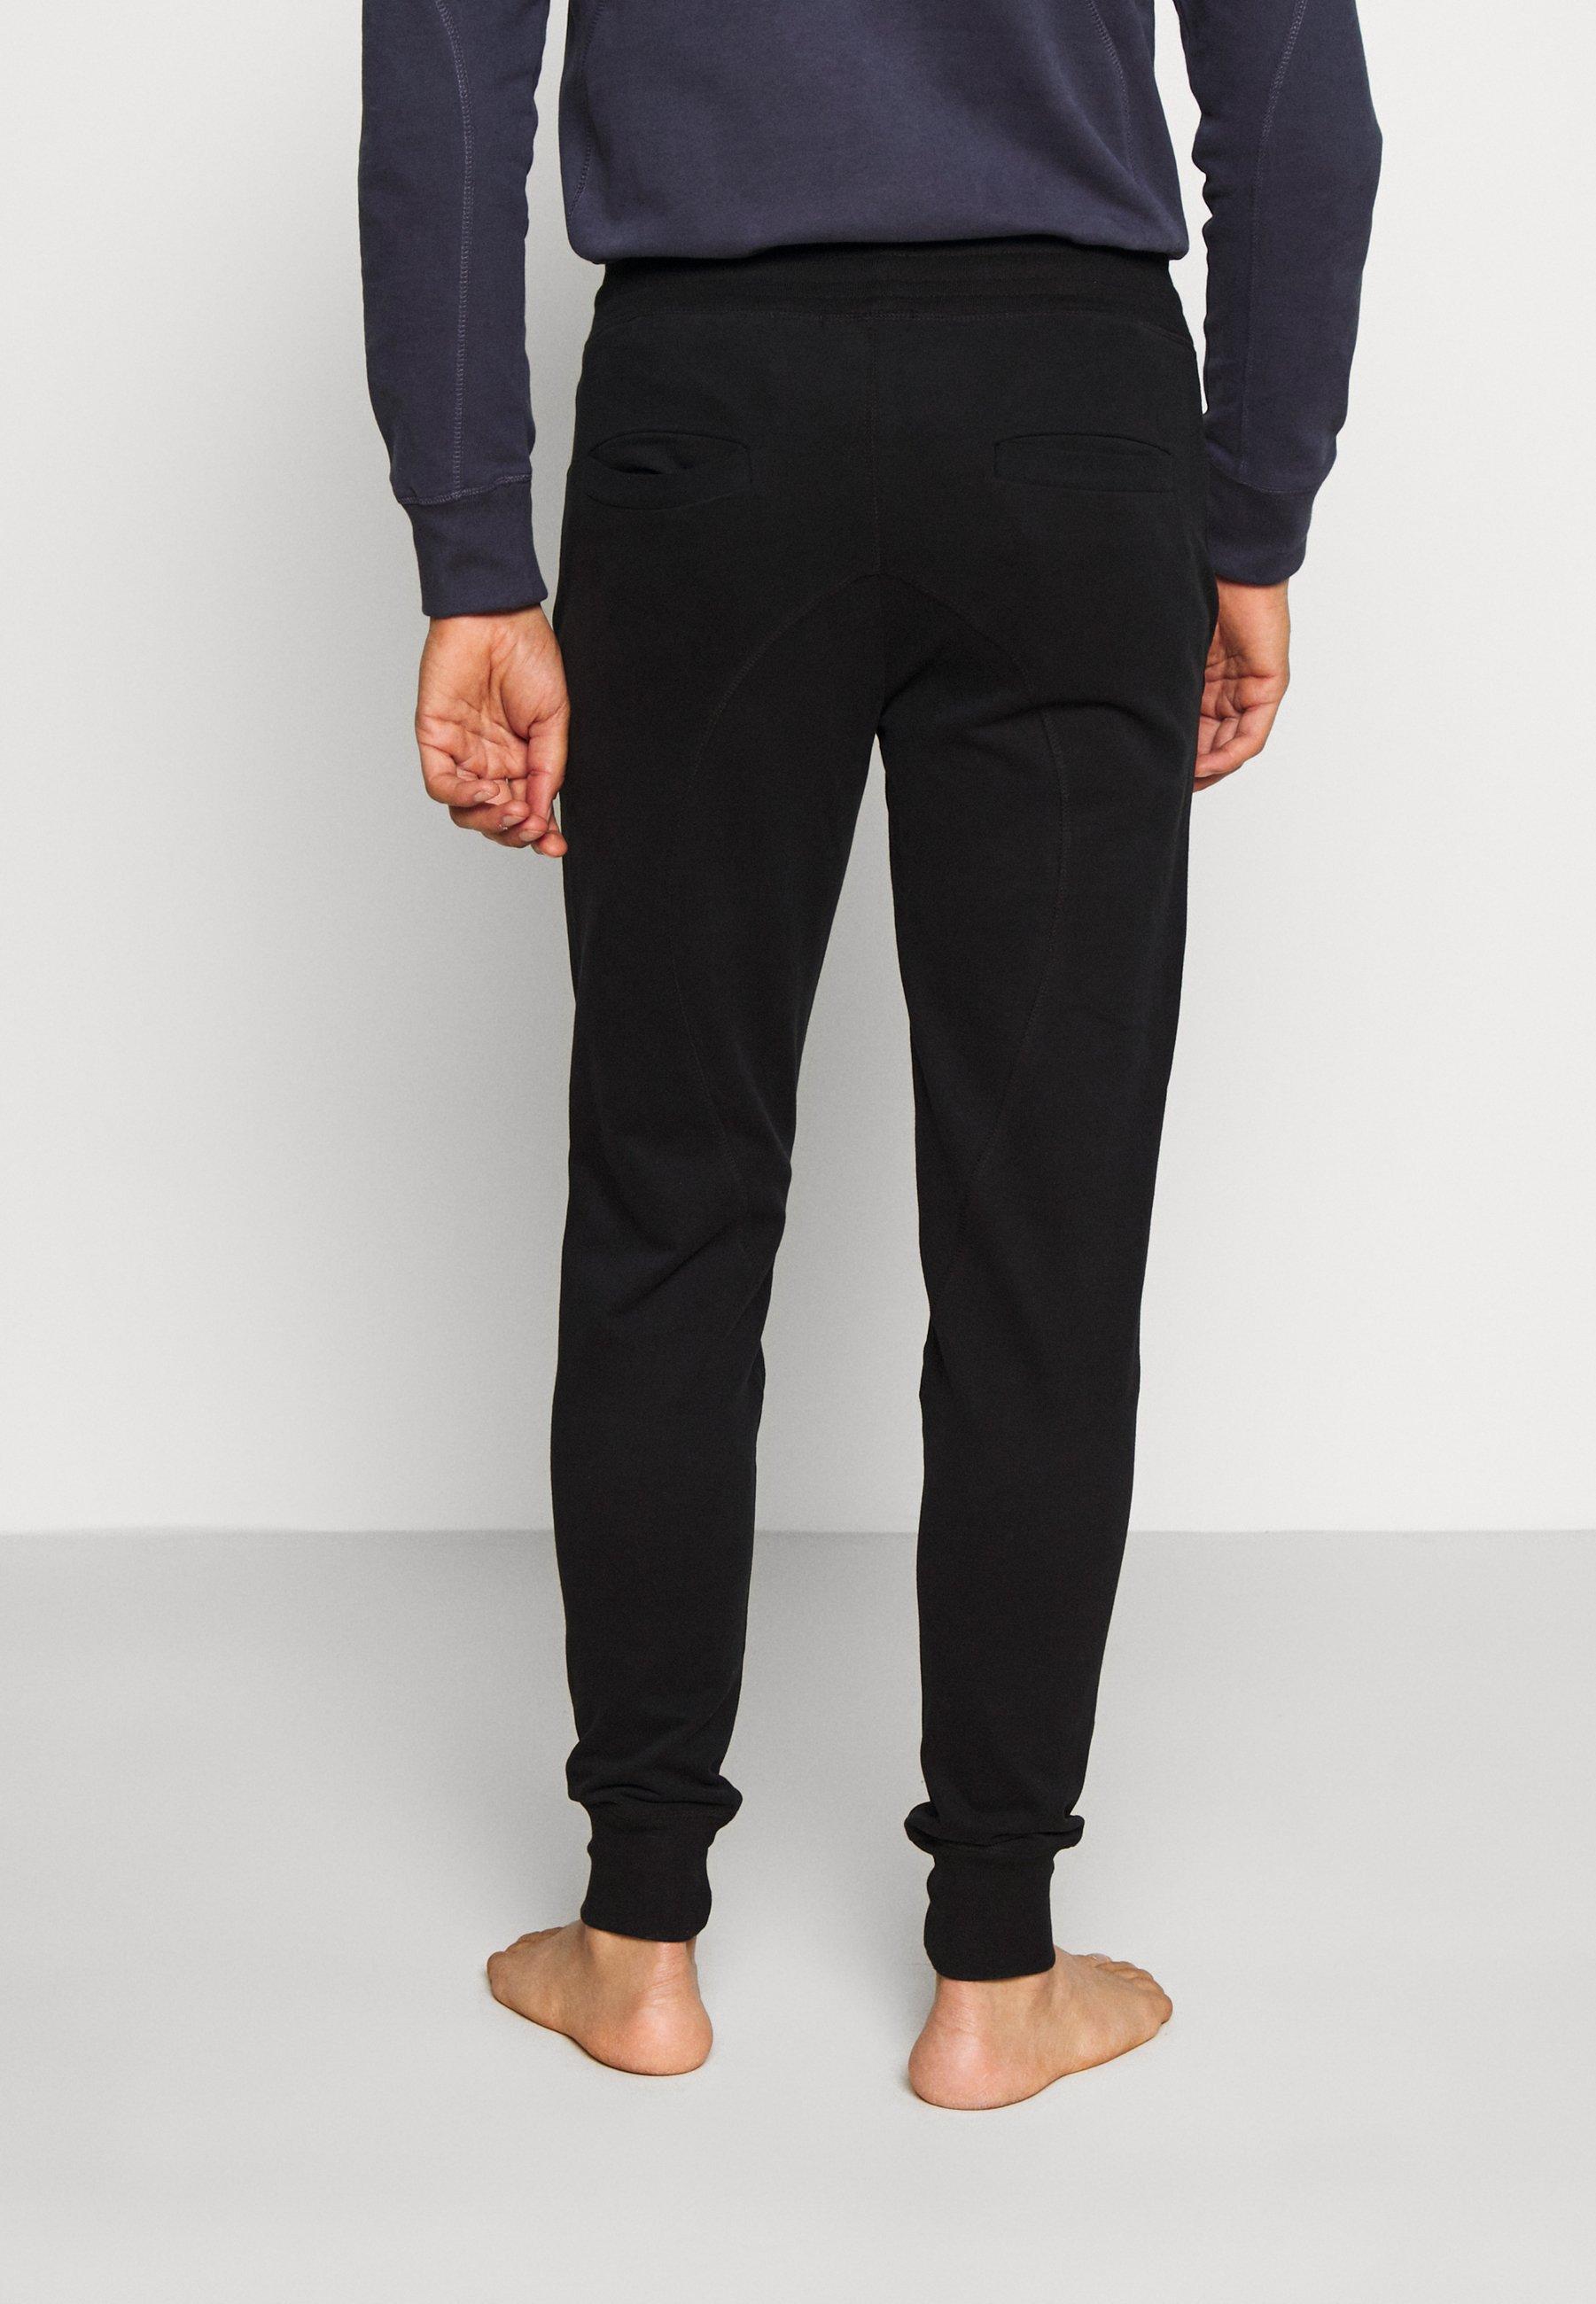 Frescobol Carioca LEBLON - Pyjamasbukse - black